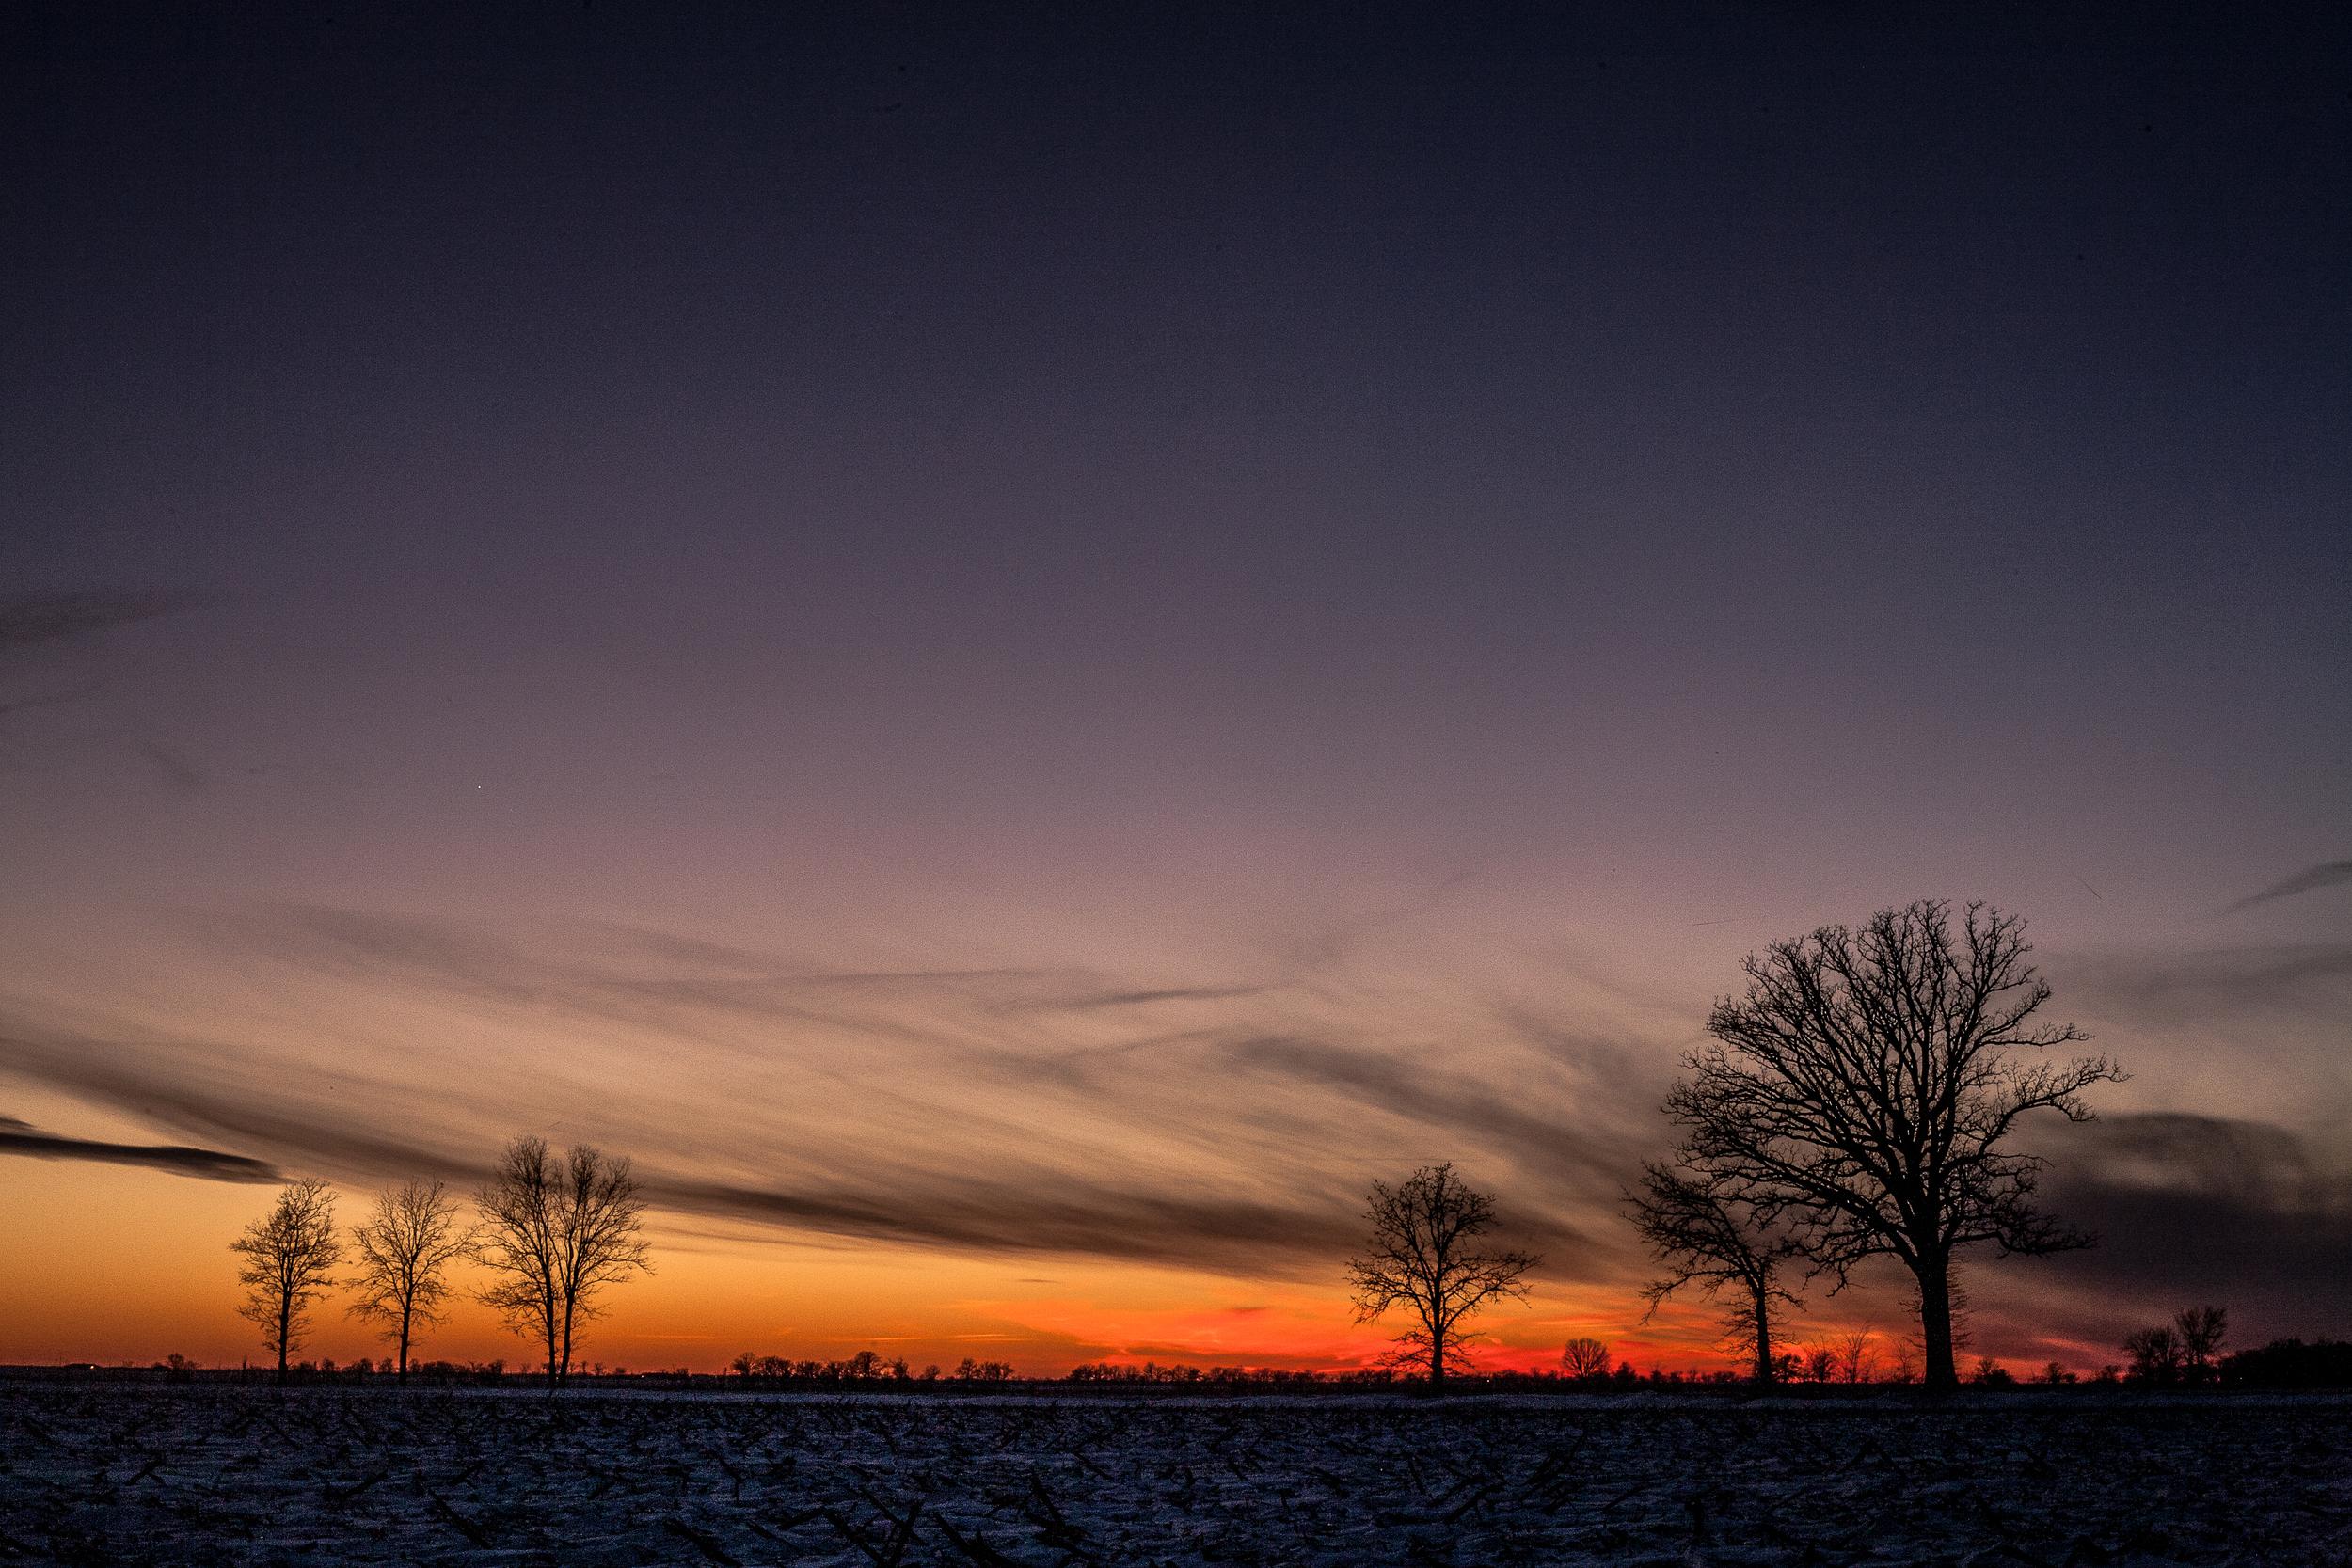 sunset over madison county.jpg